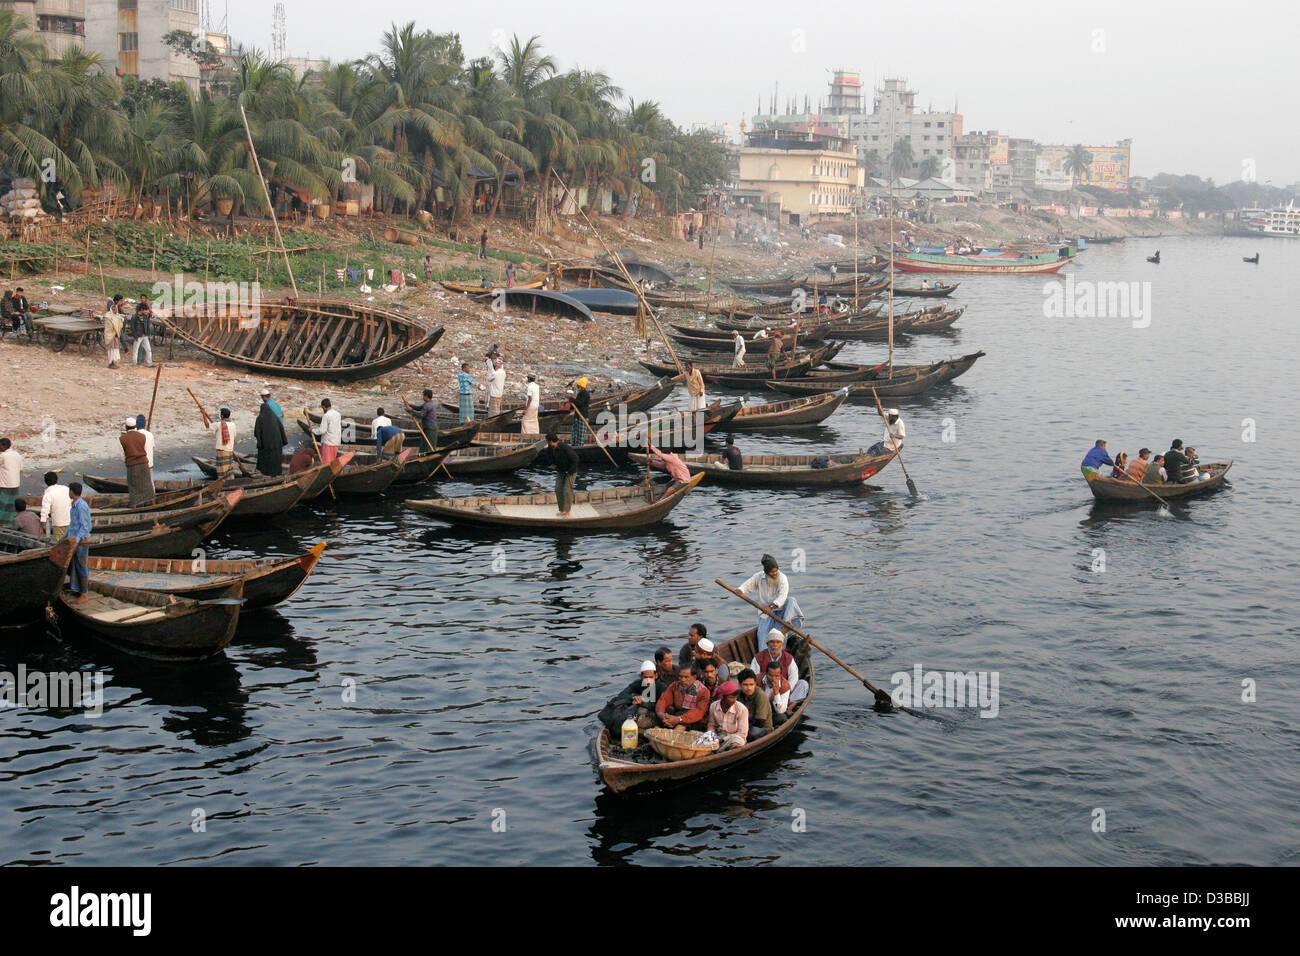 Buriganga river bank with small row boats in Dhaka, Bangladesh - Stock Image